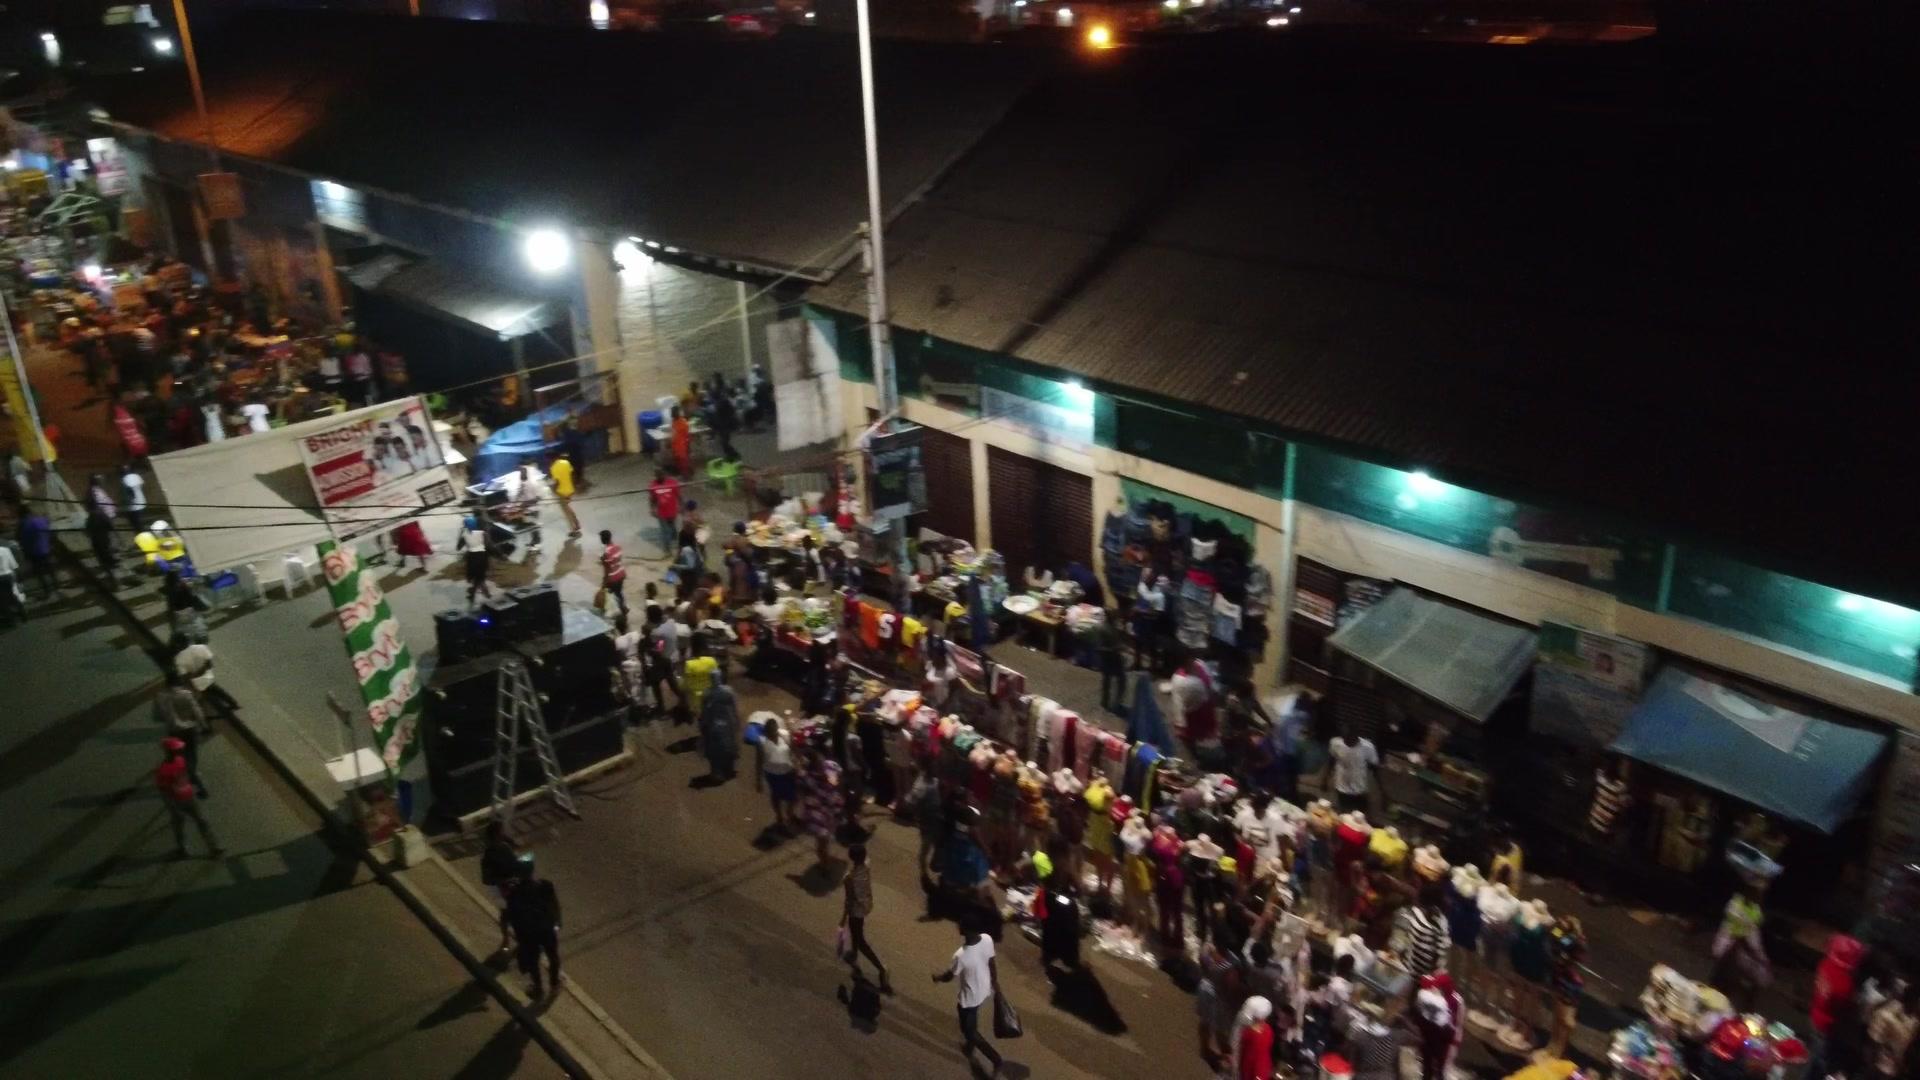 Koforidua Night Street Market Crowded Traders Busy Scene 2